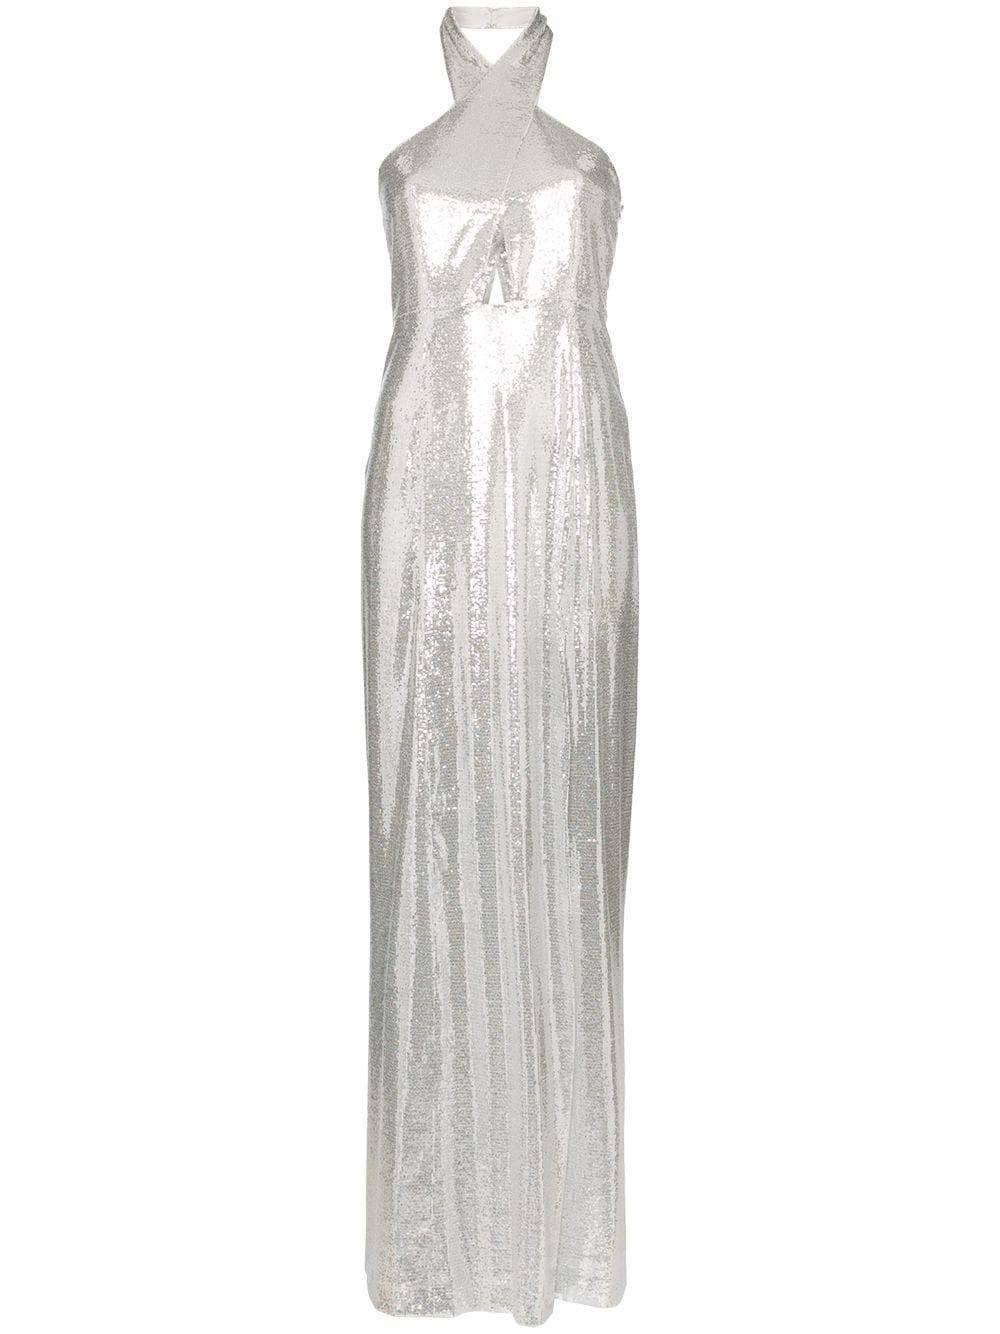 Silver Sequin Halter Maxi Dress